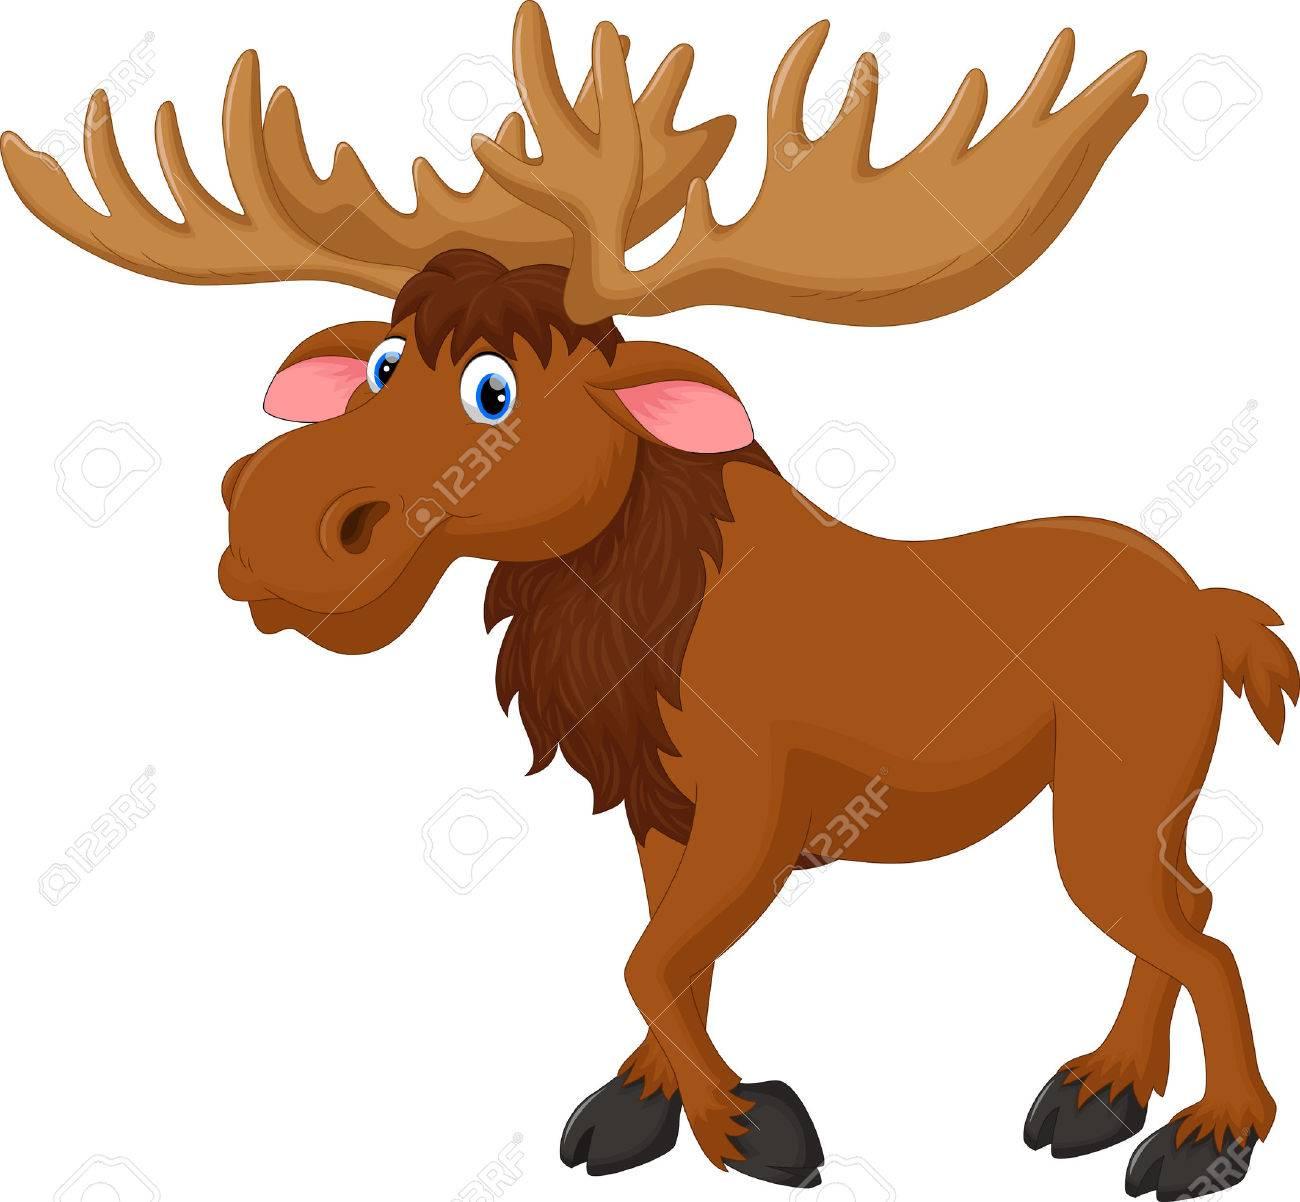 Illustration of moose cartoon - 48070235